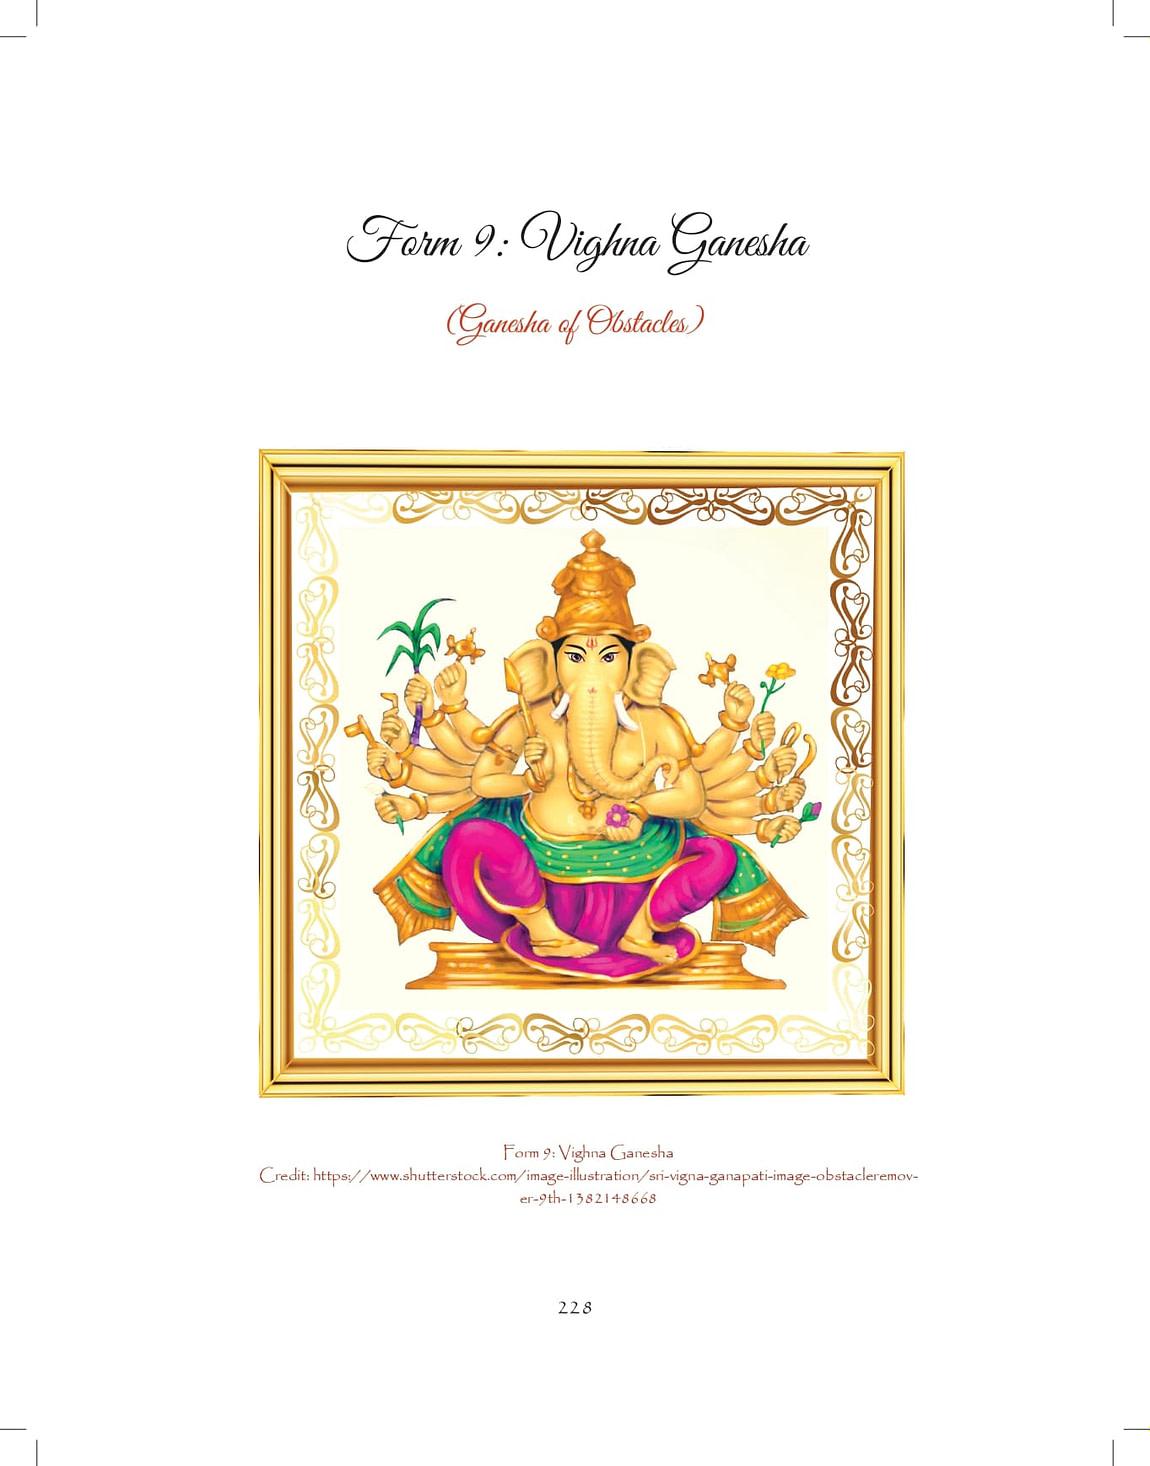 Ganesh-print_pages-to-jpg-0228.jpg